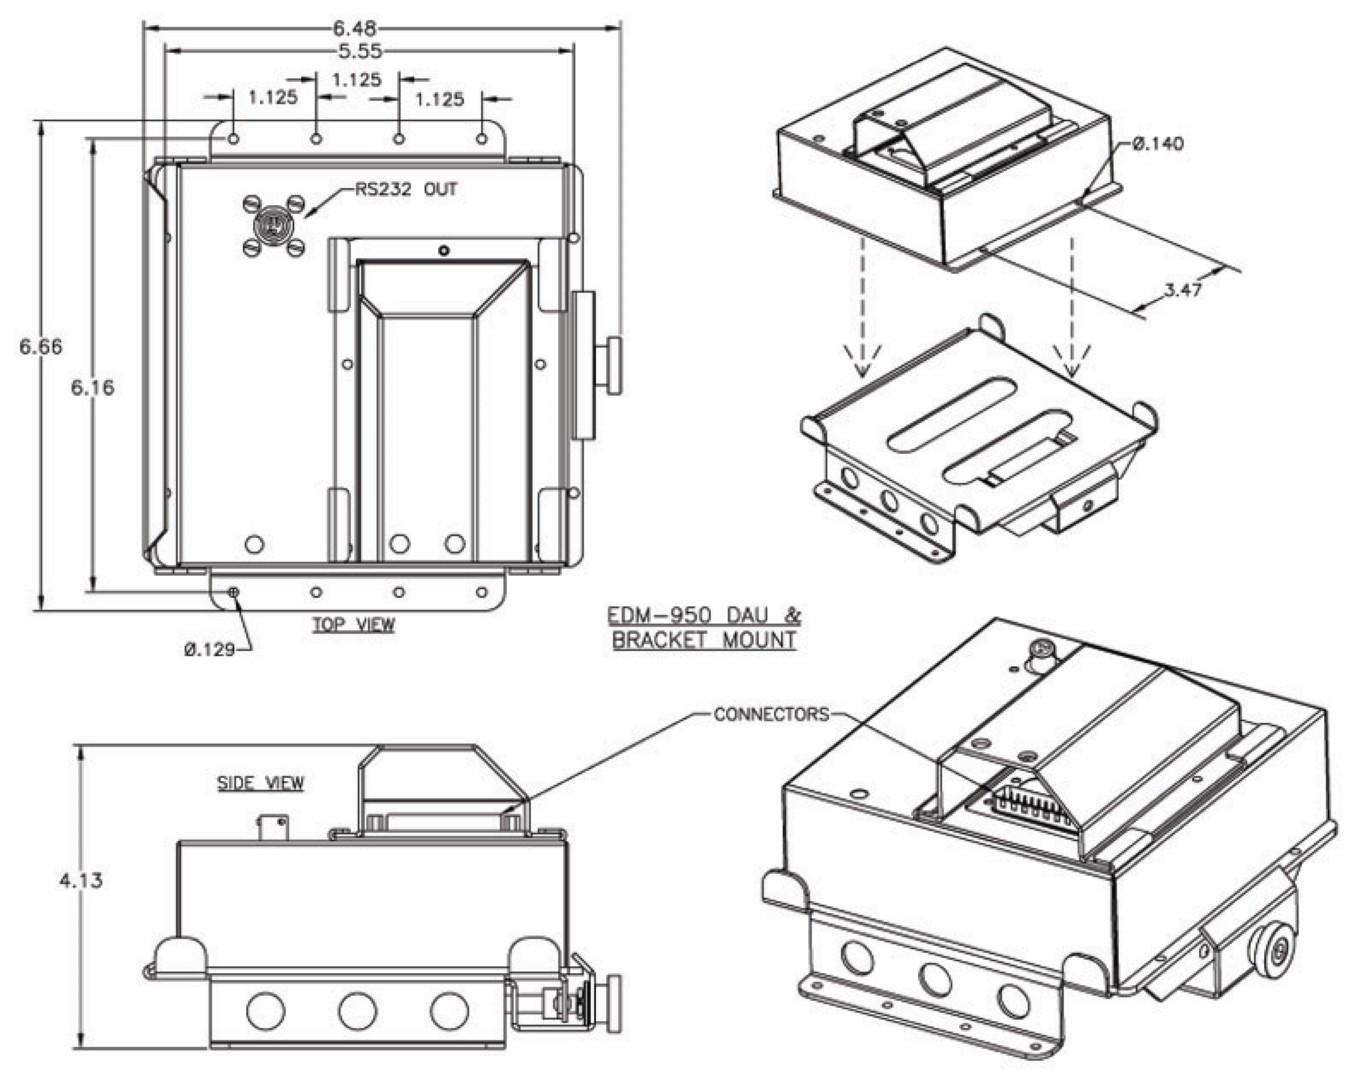 Diagram Installation Manual Gma 340 Electrical Panel Wiring Http Wwwmstewartnet Super8 Array J P Instruments Edm 960 Twin Rh Jpinstruments Com